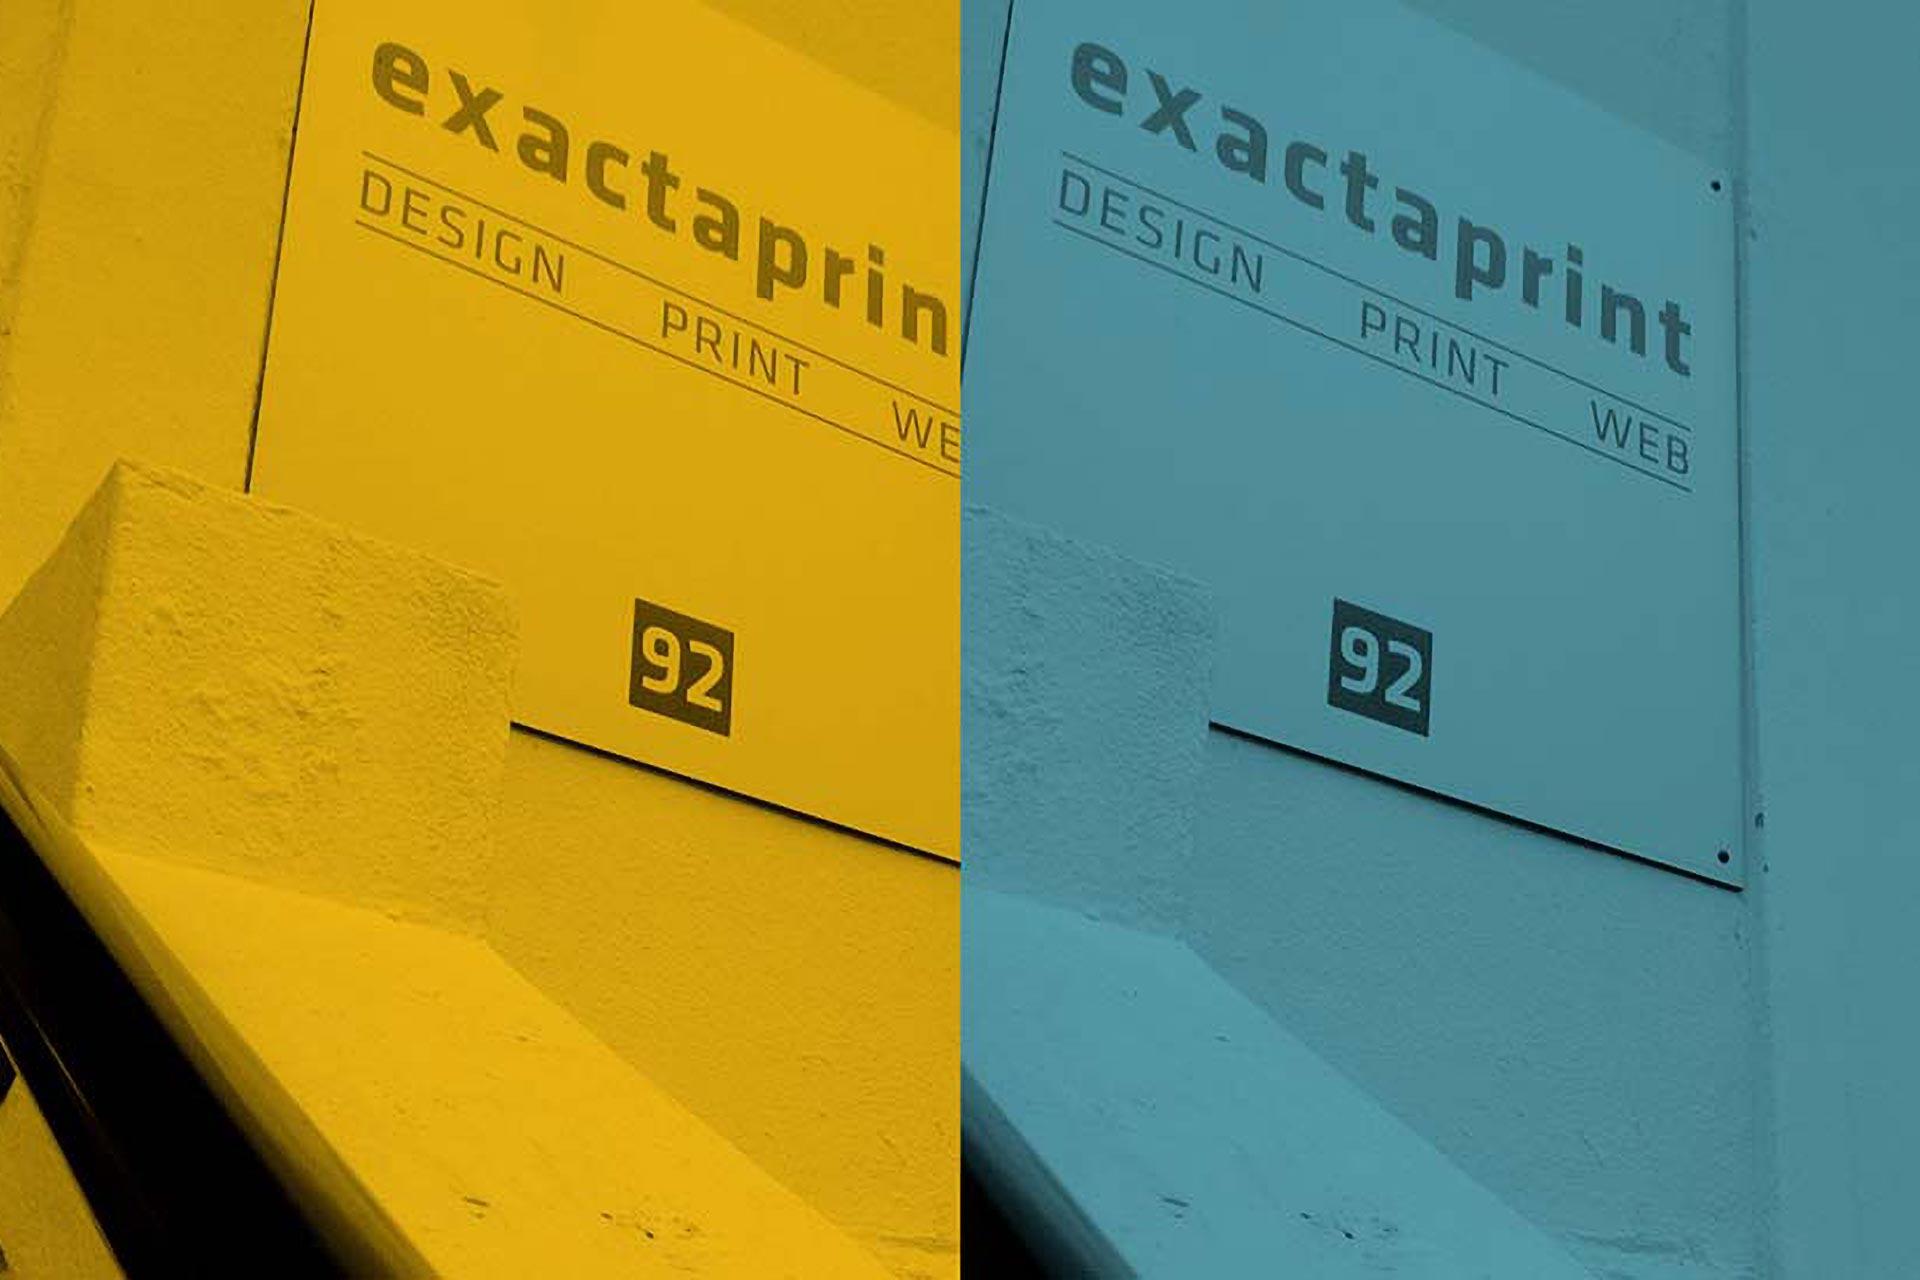 Dual tone (yellow + cyan) image of Exacta Print shop sign and hand rail